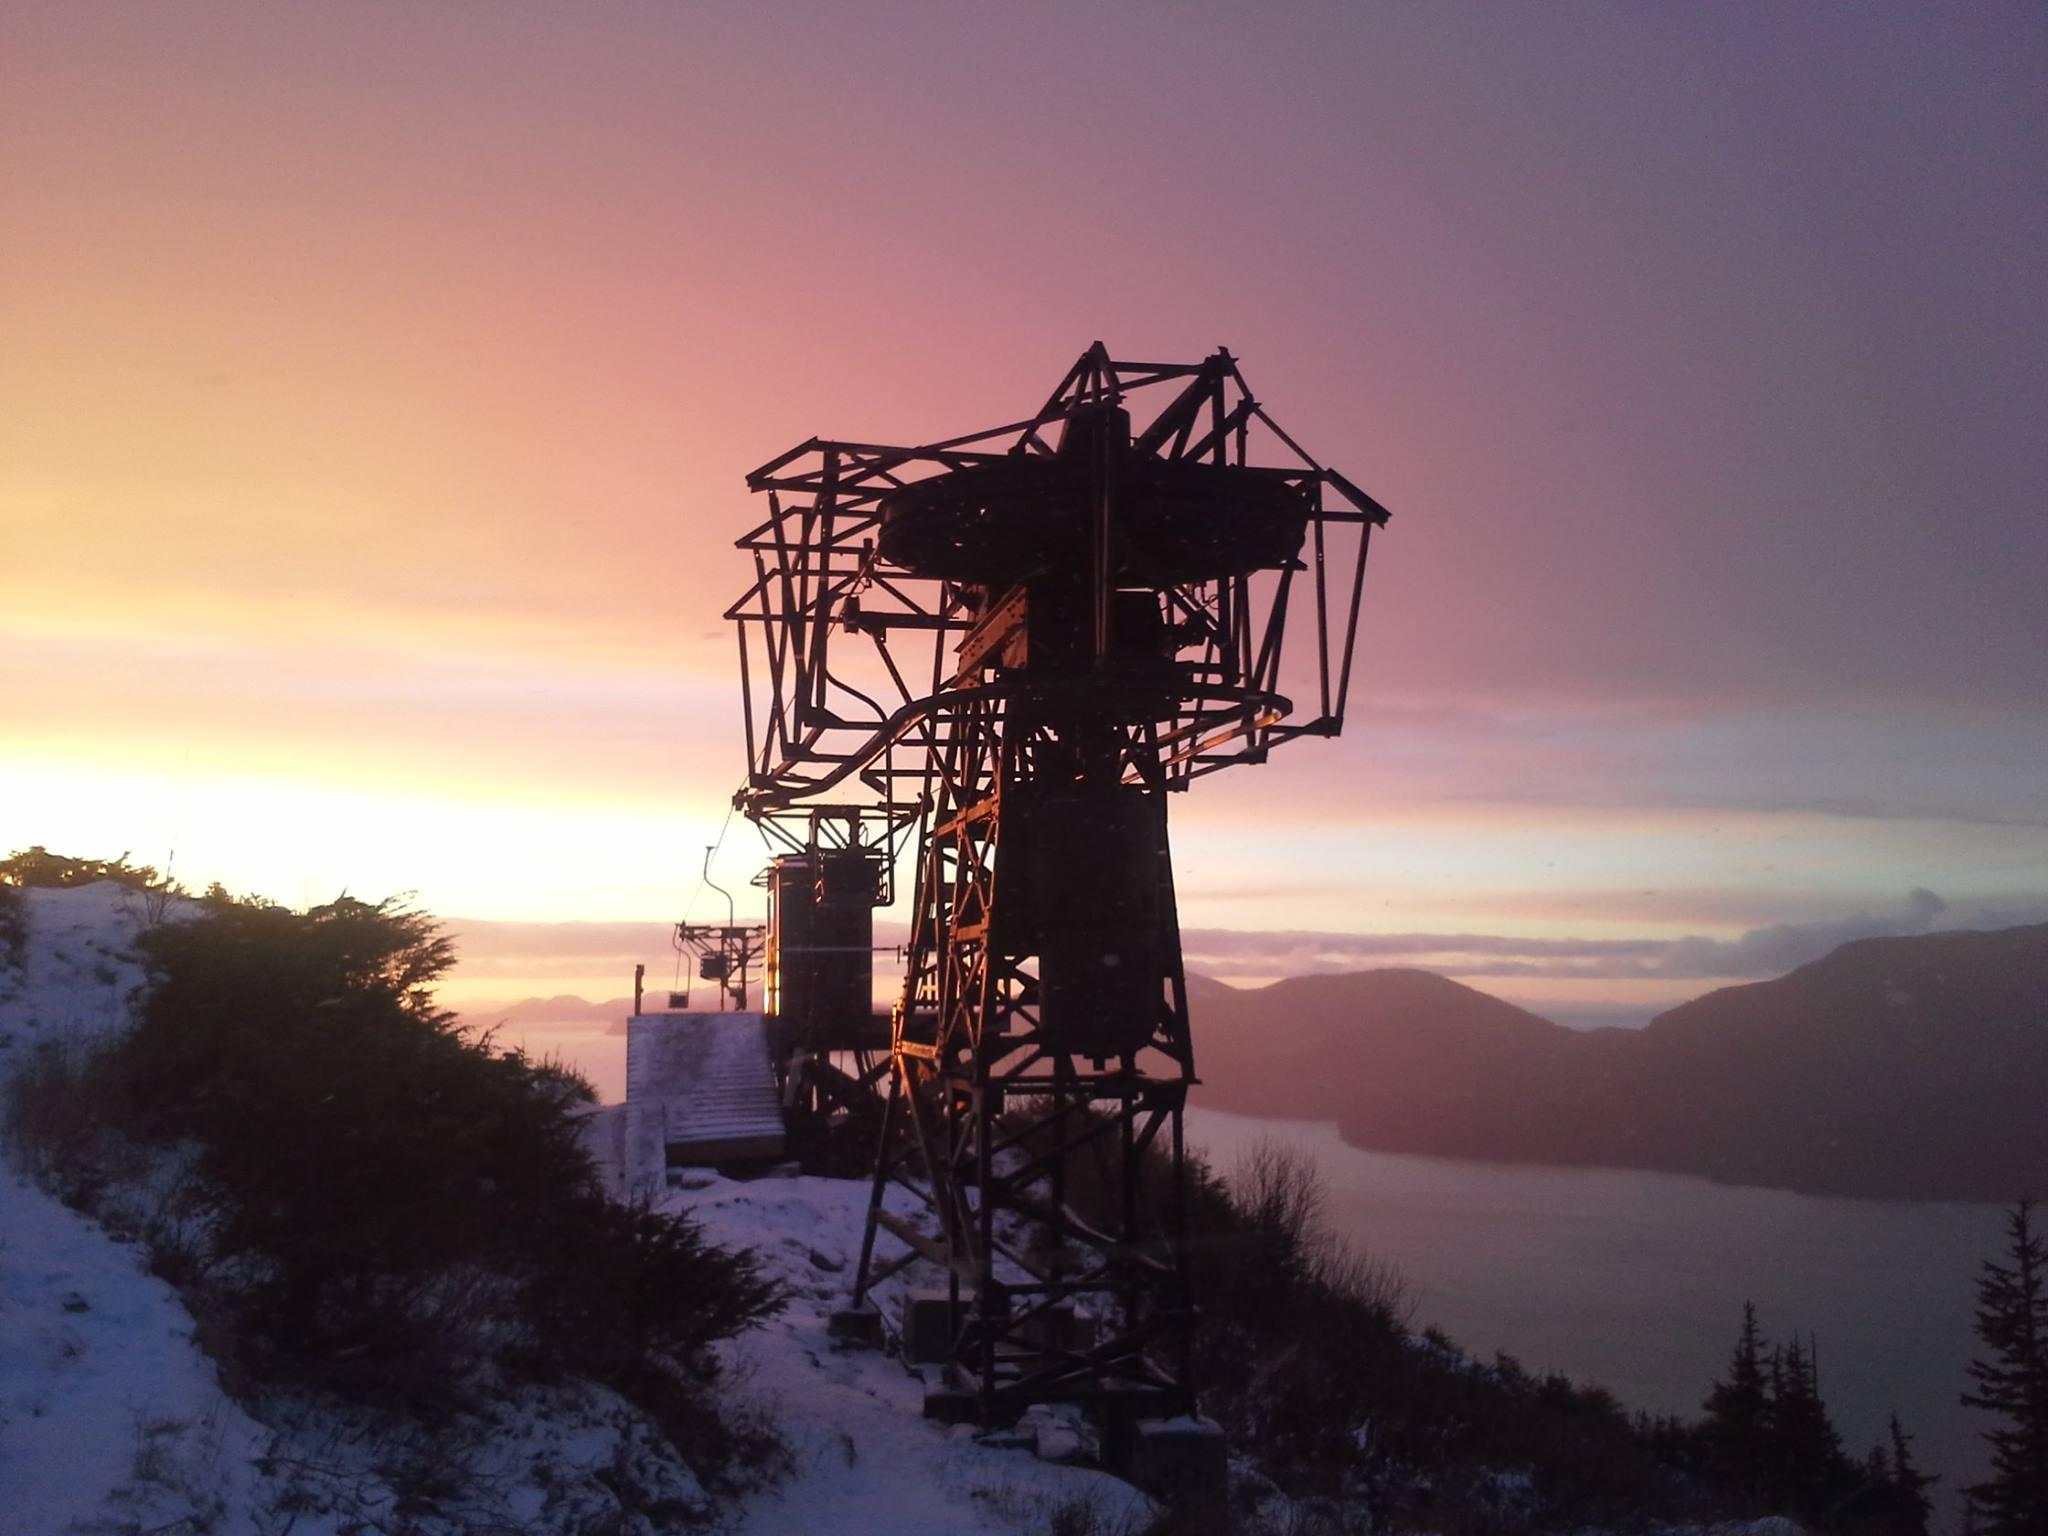 Prices - Lift Tickets, Rental Equipment, and Sheridan Alpine Association Memberships